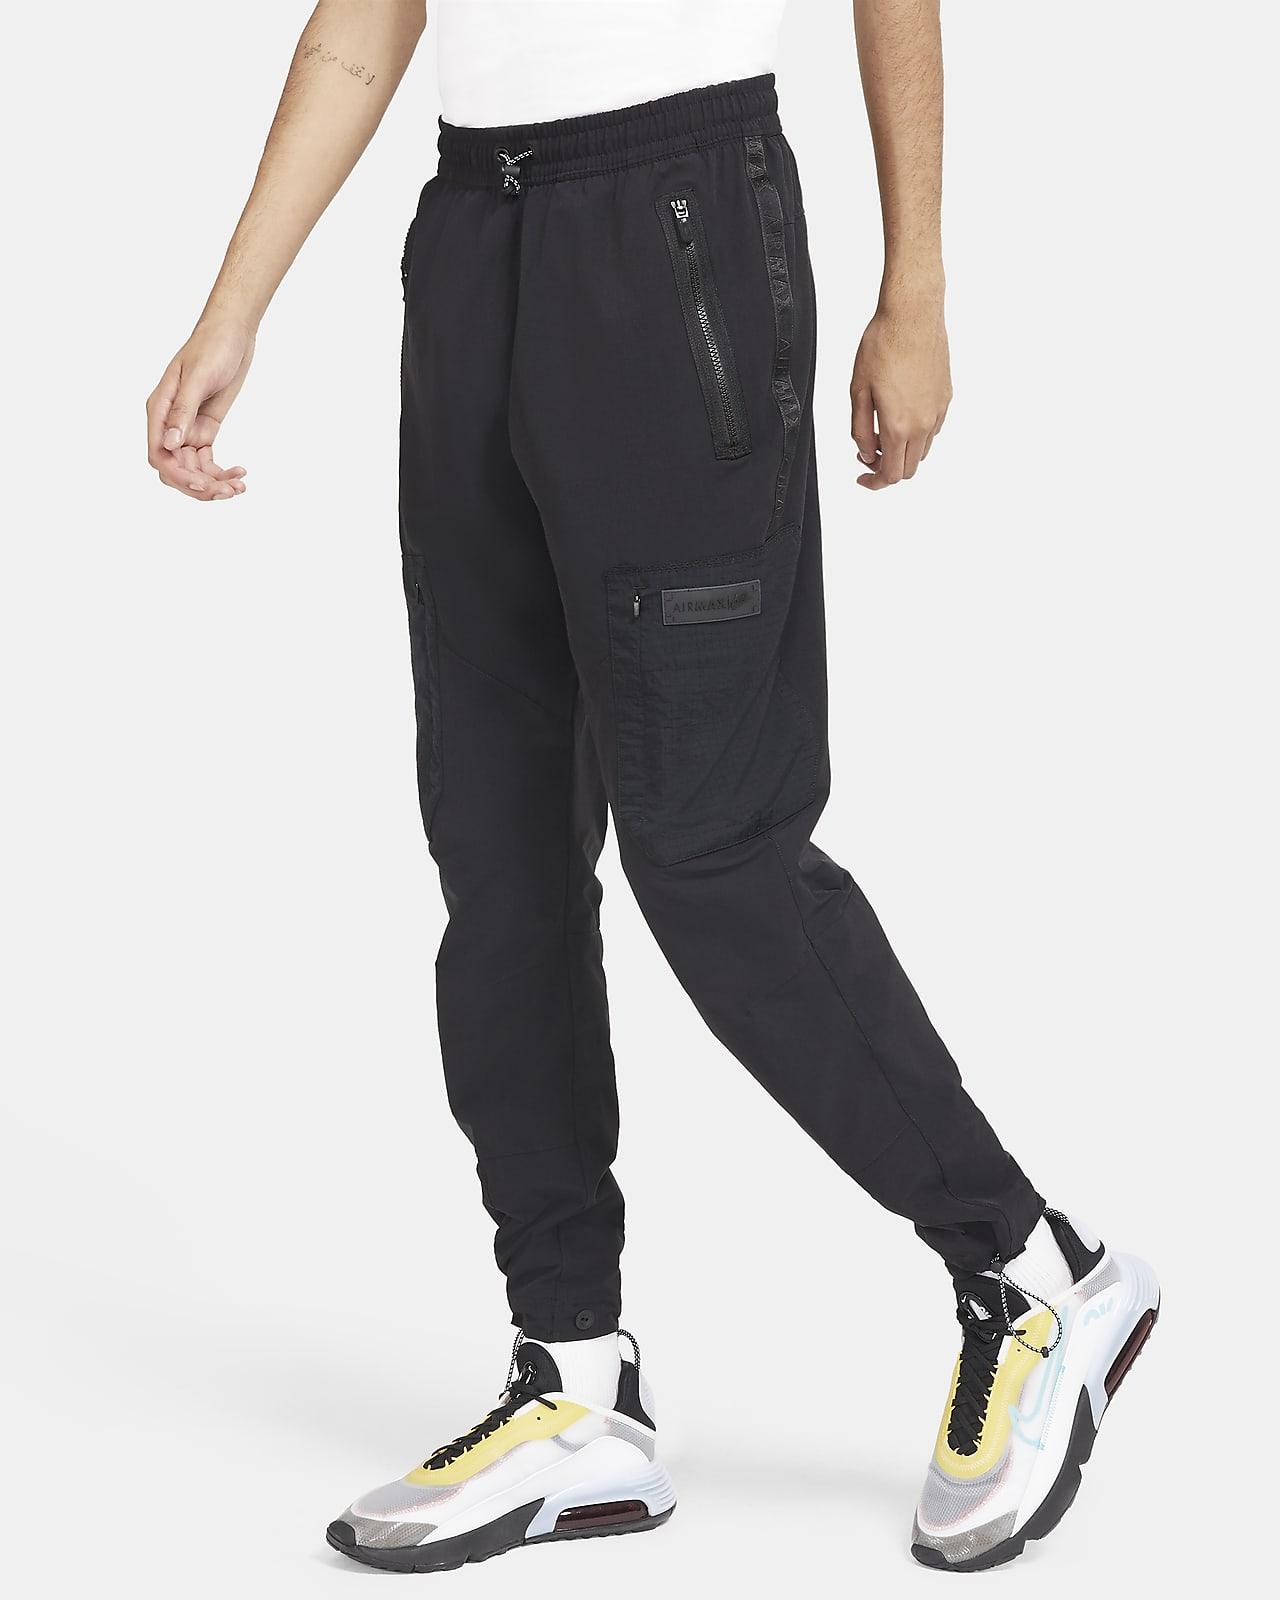 Nike Sportswear Air Max Web-Cargohose für Herren